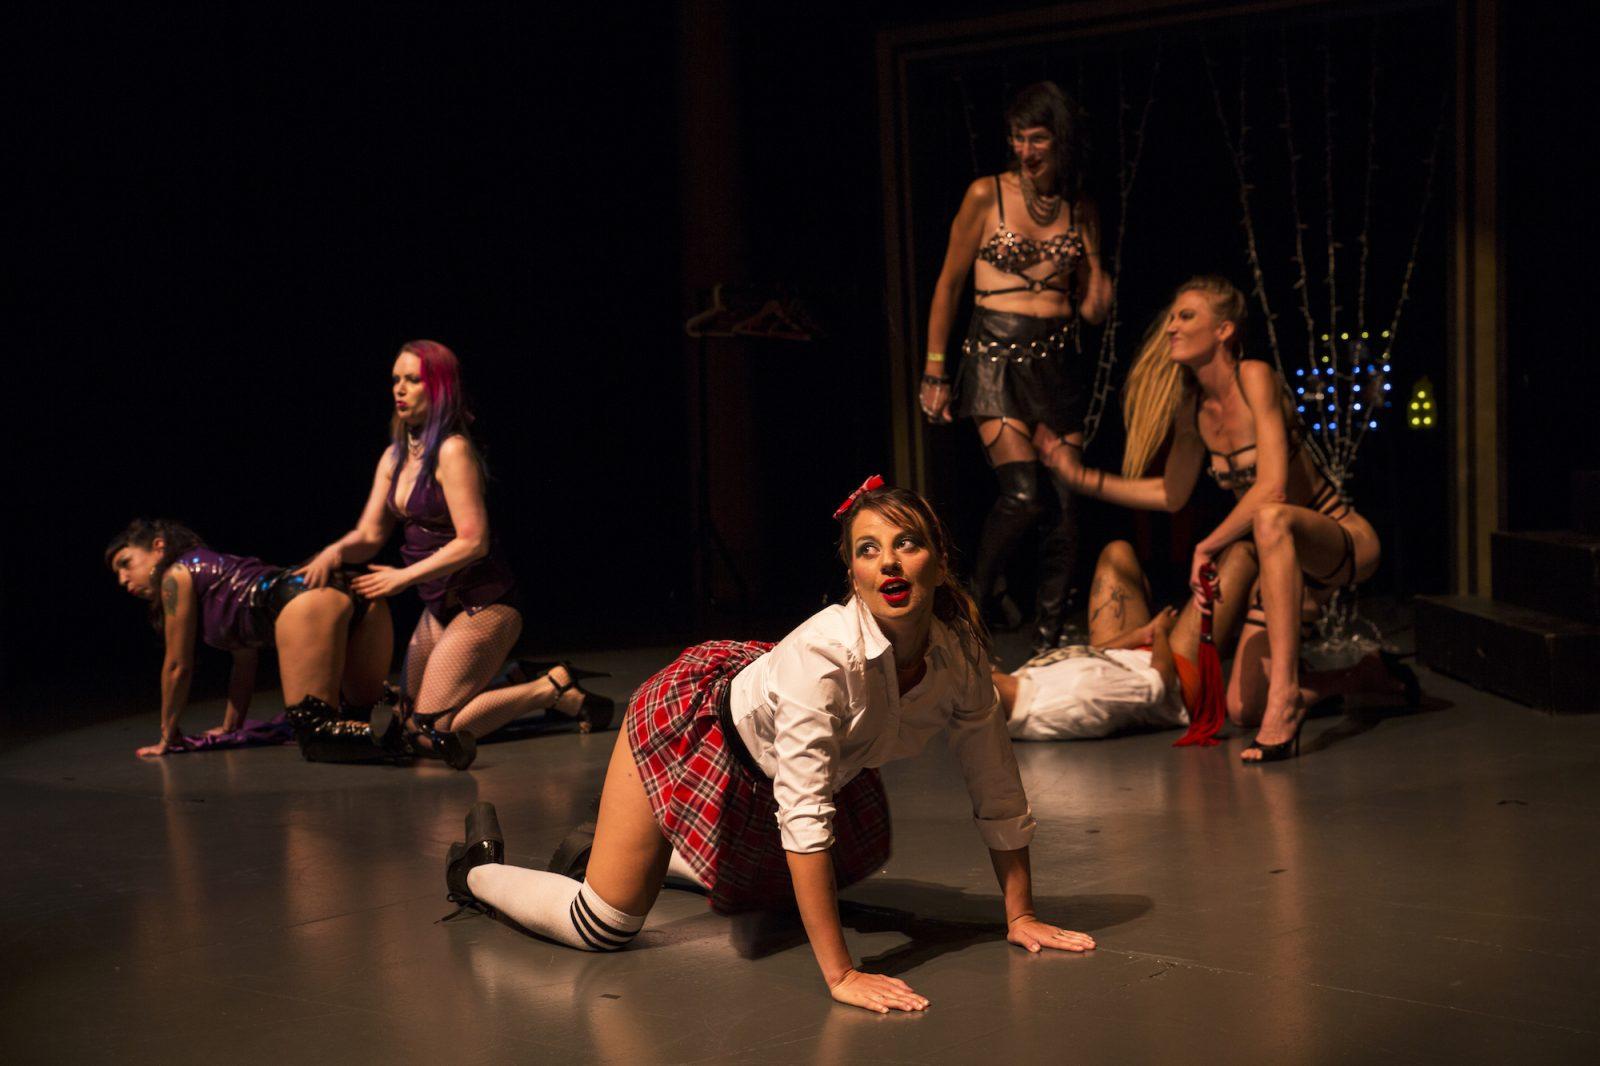 sex-workers-opera-premiere3